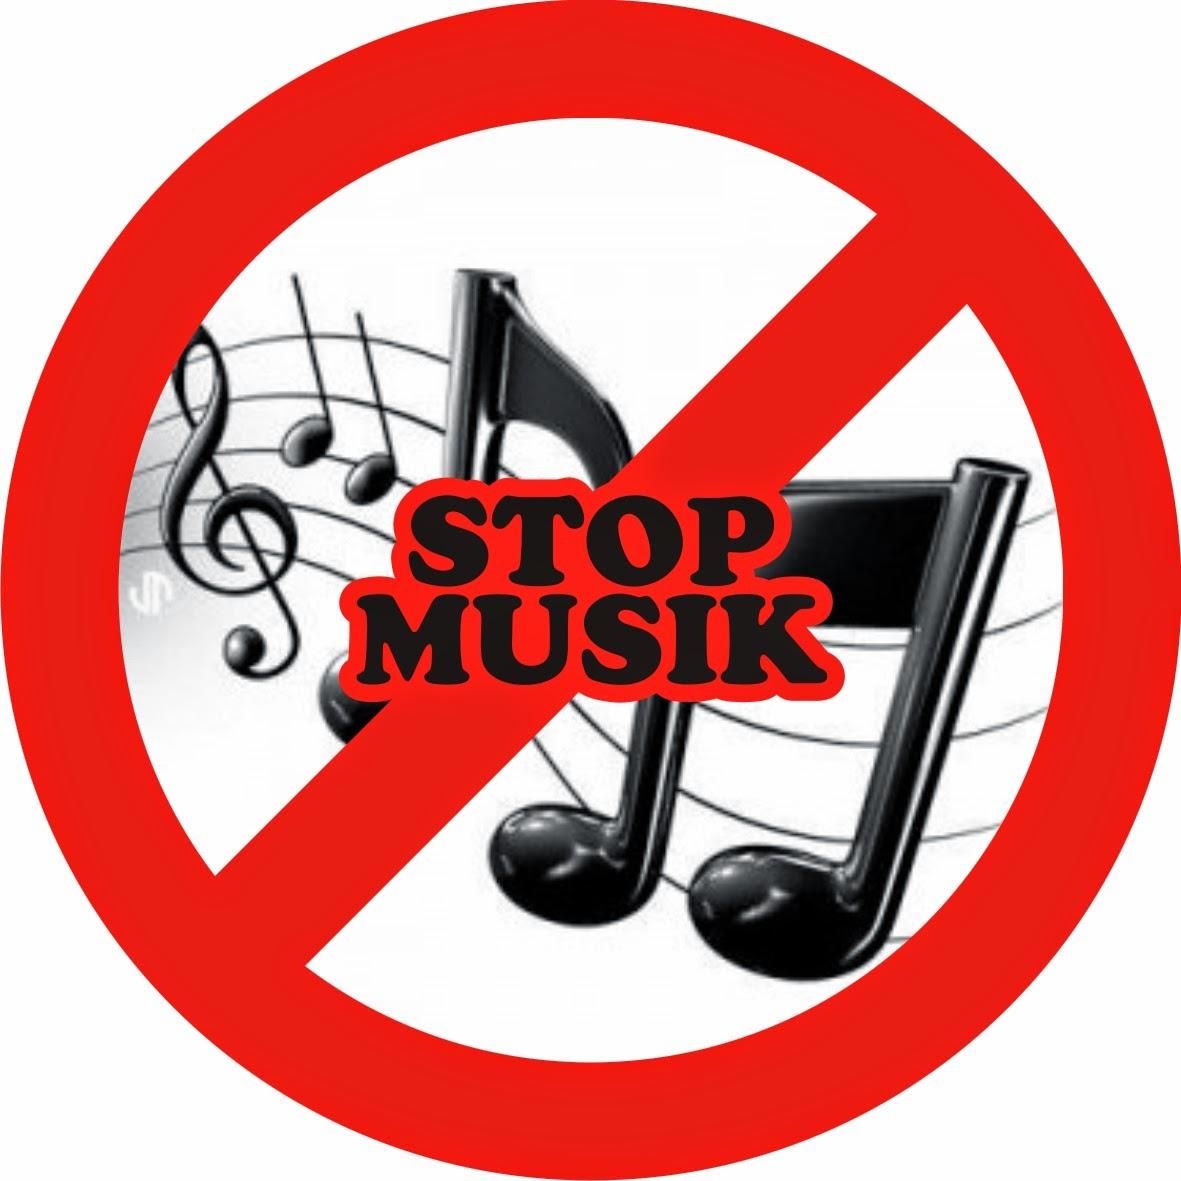 stop musik,musik haram,anti musik,musik logo